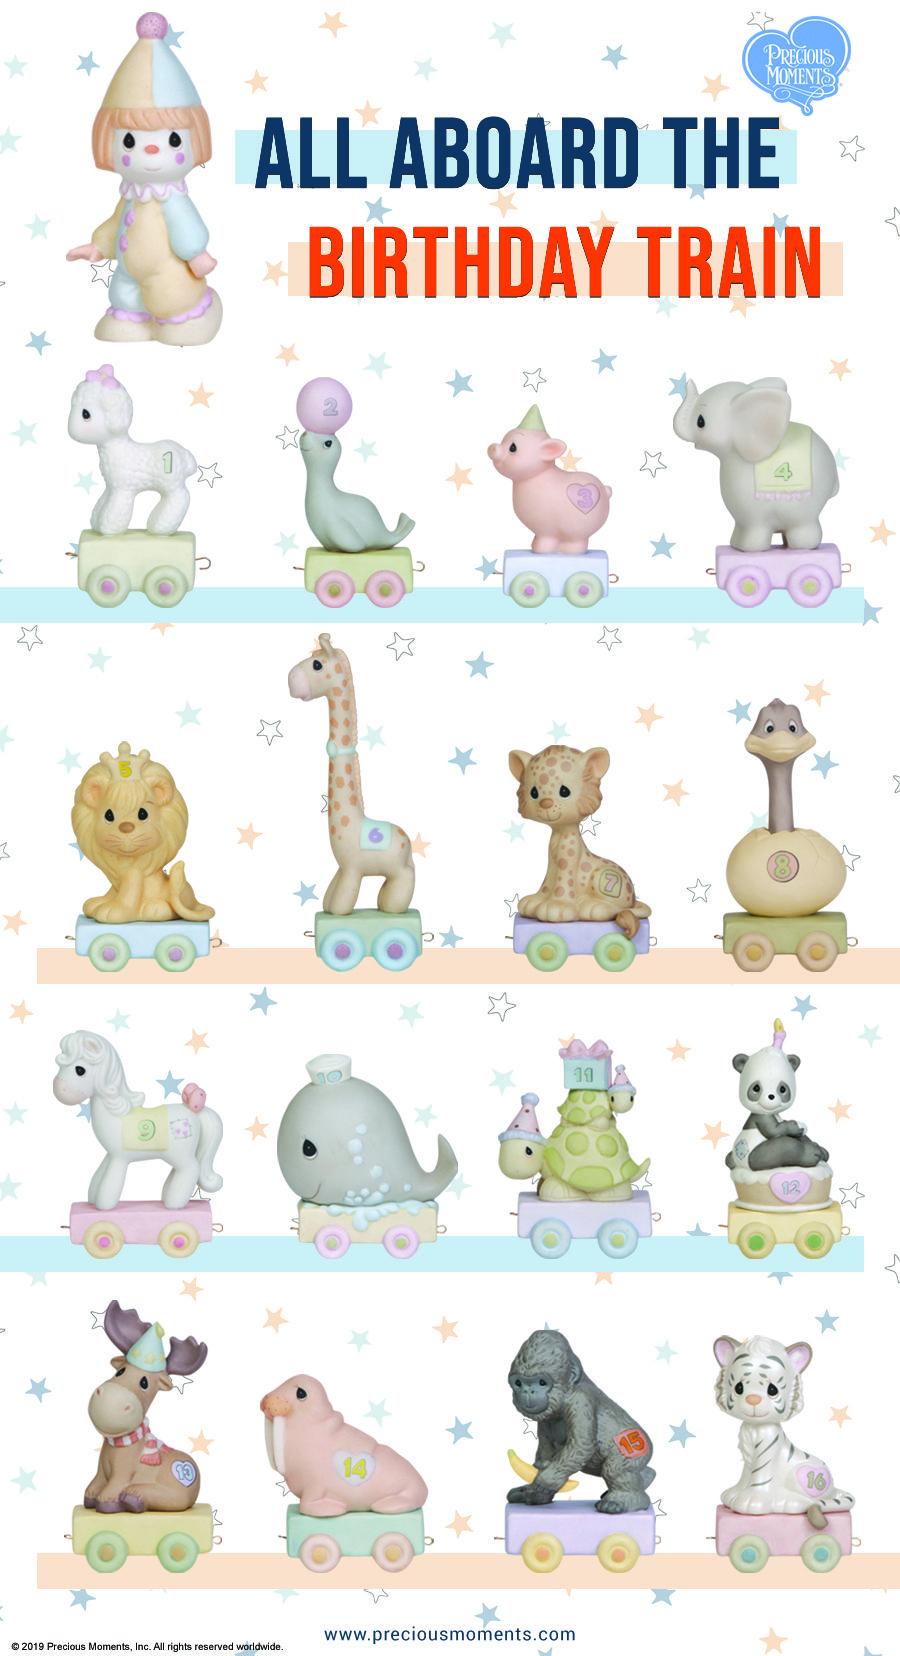 Sitting Baby Giraffe Ornament Figurine Figure Gift Present Birthday Mothers day